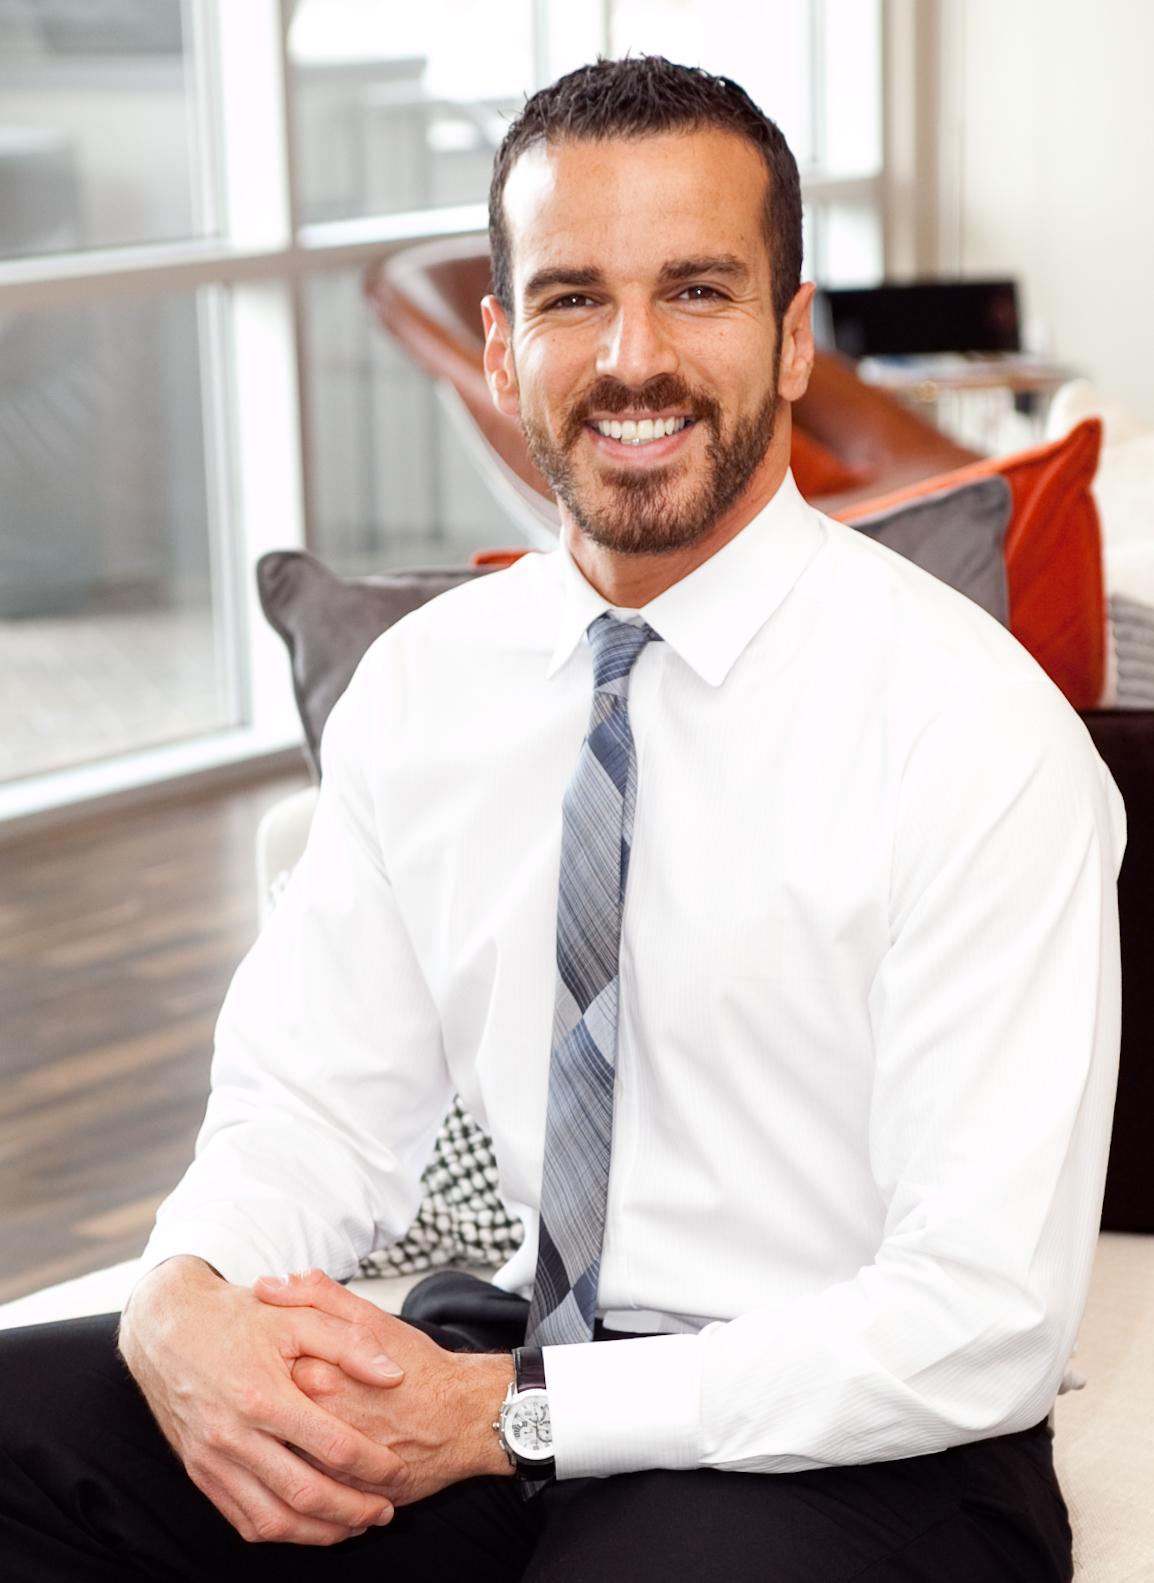 Featured Gay Realtor: Avi Dan-Goor Prudential Americana Group Realtors, Las Vegas, NV